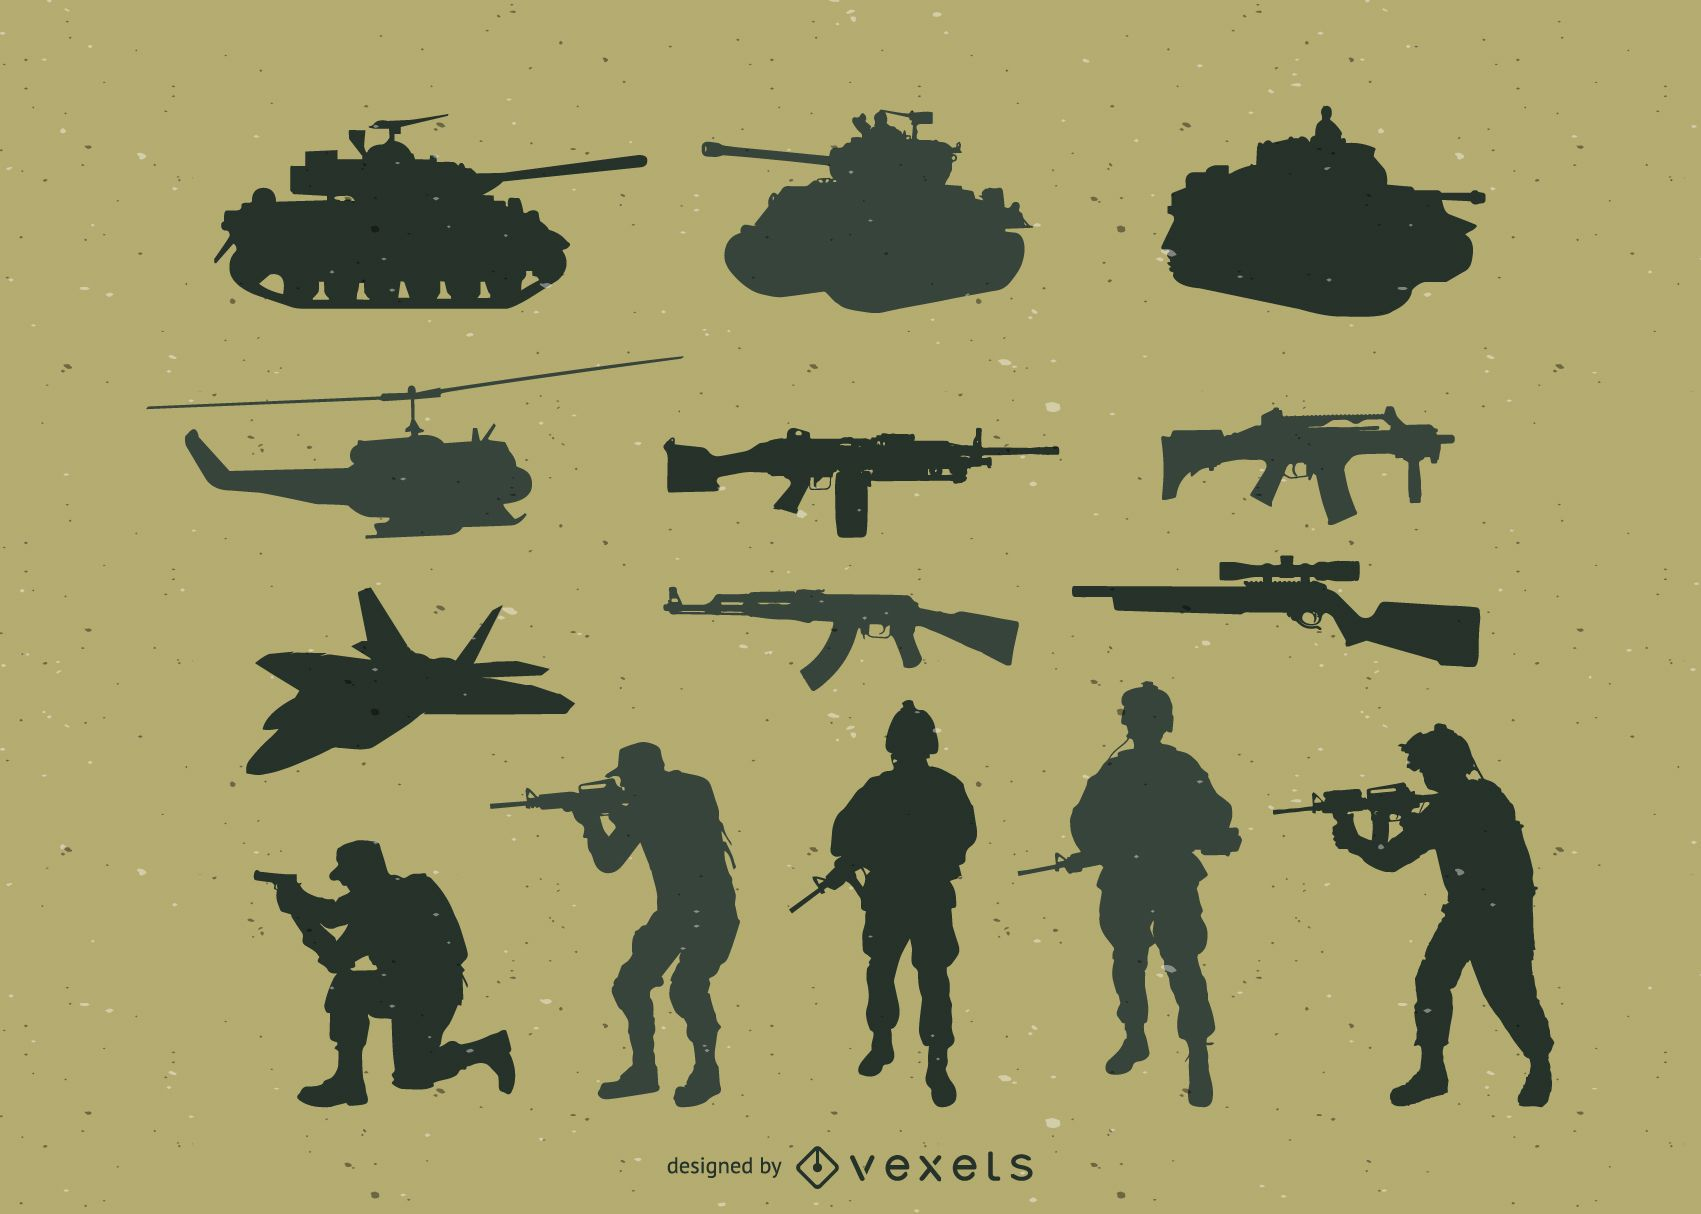 Paquete de vectores militares